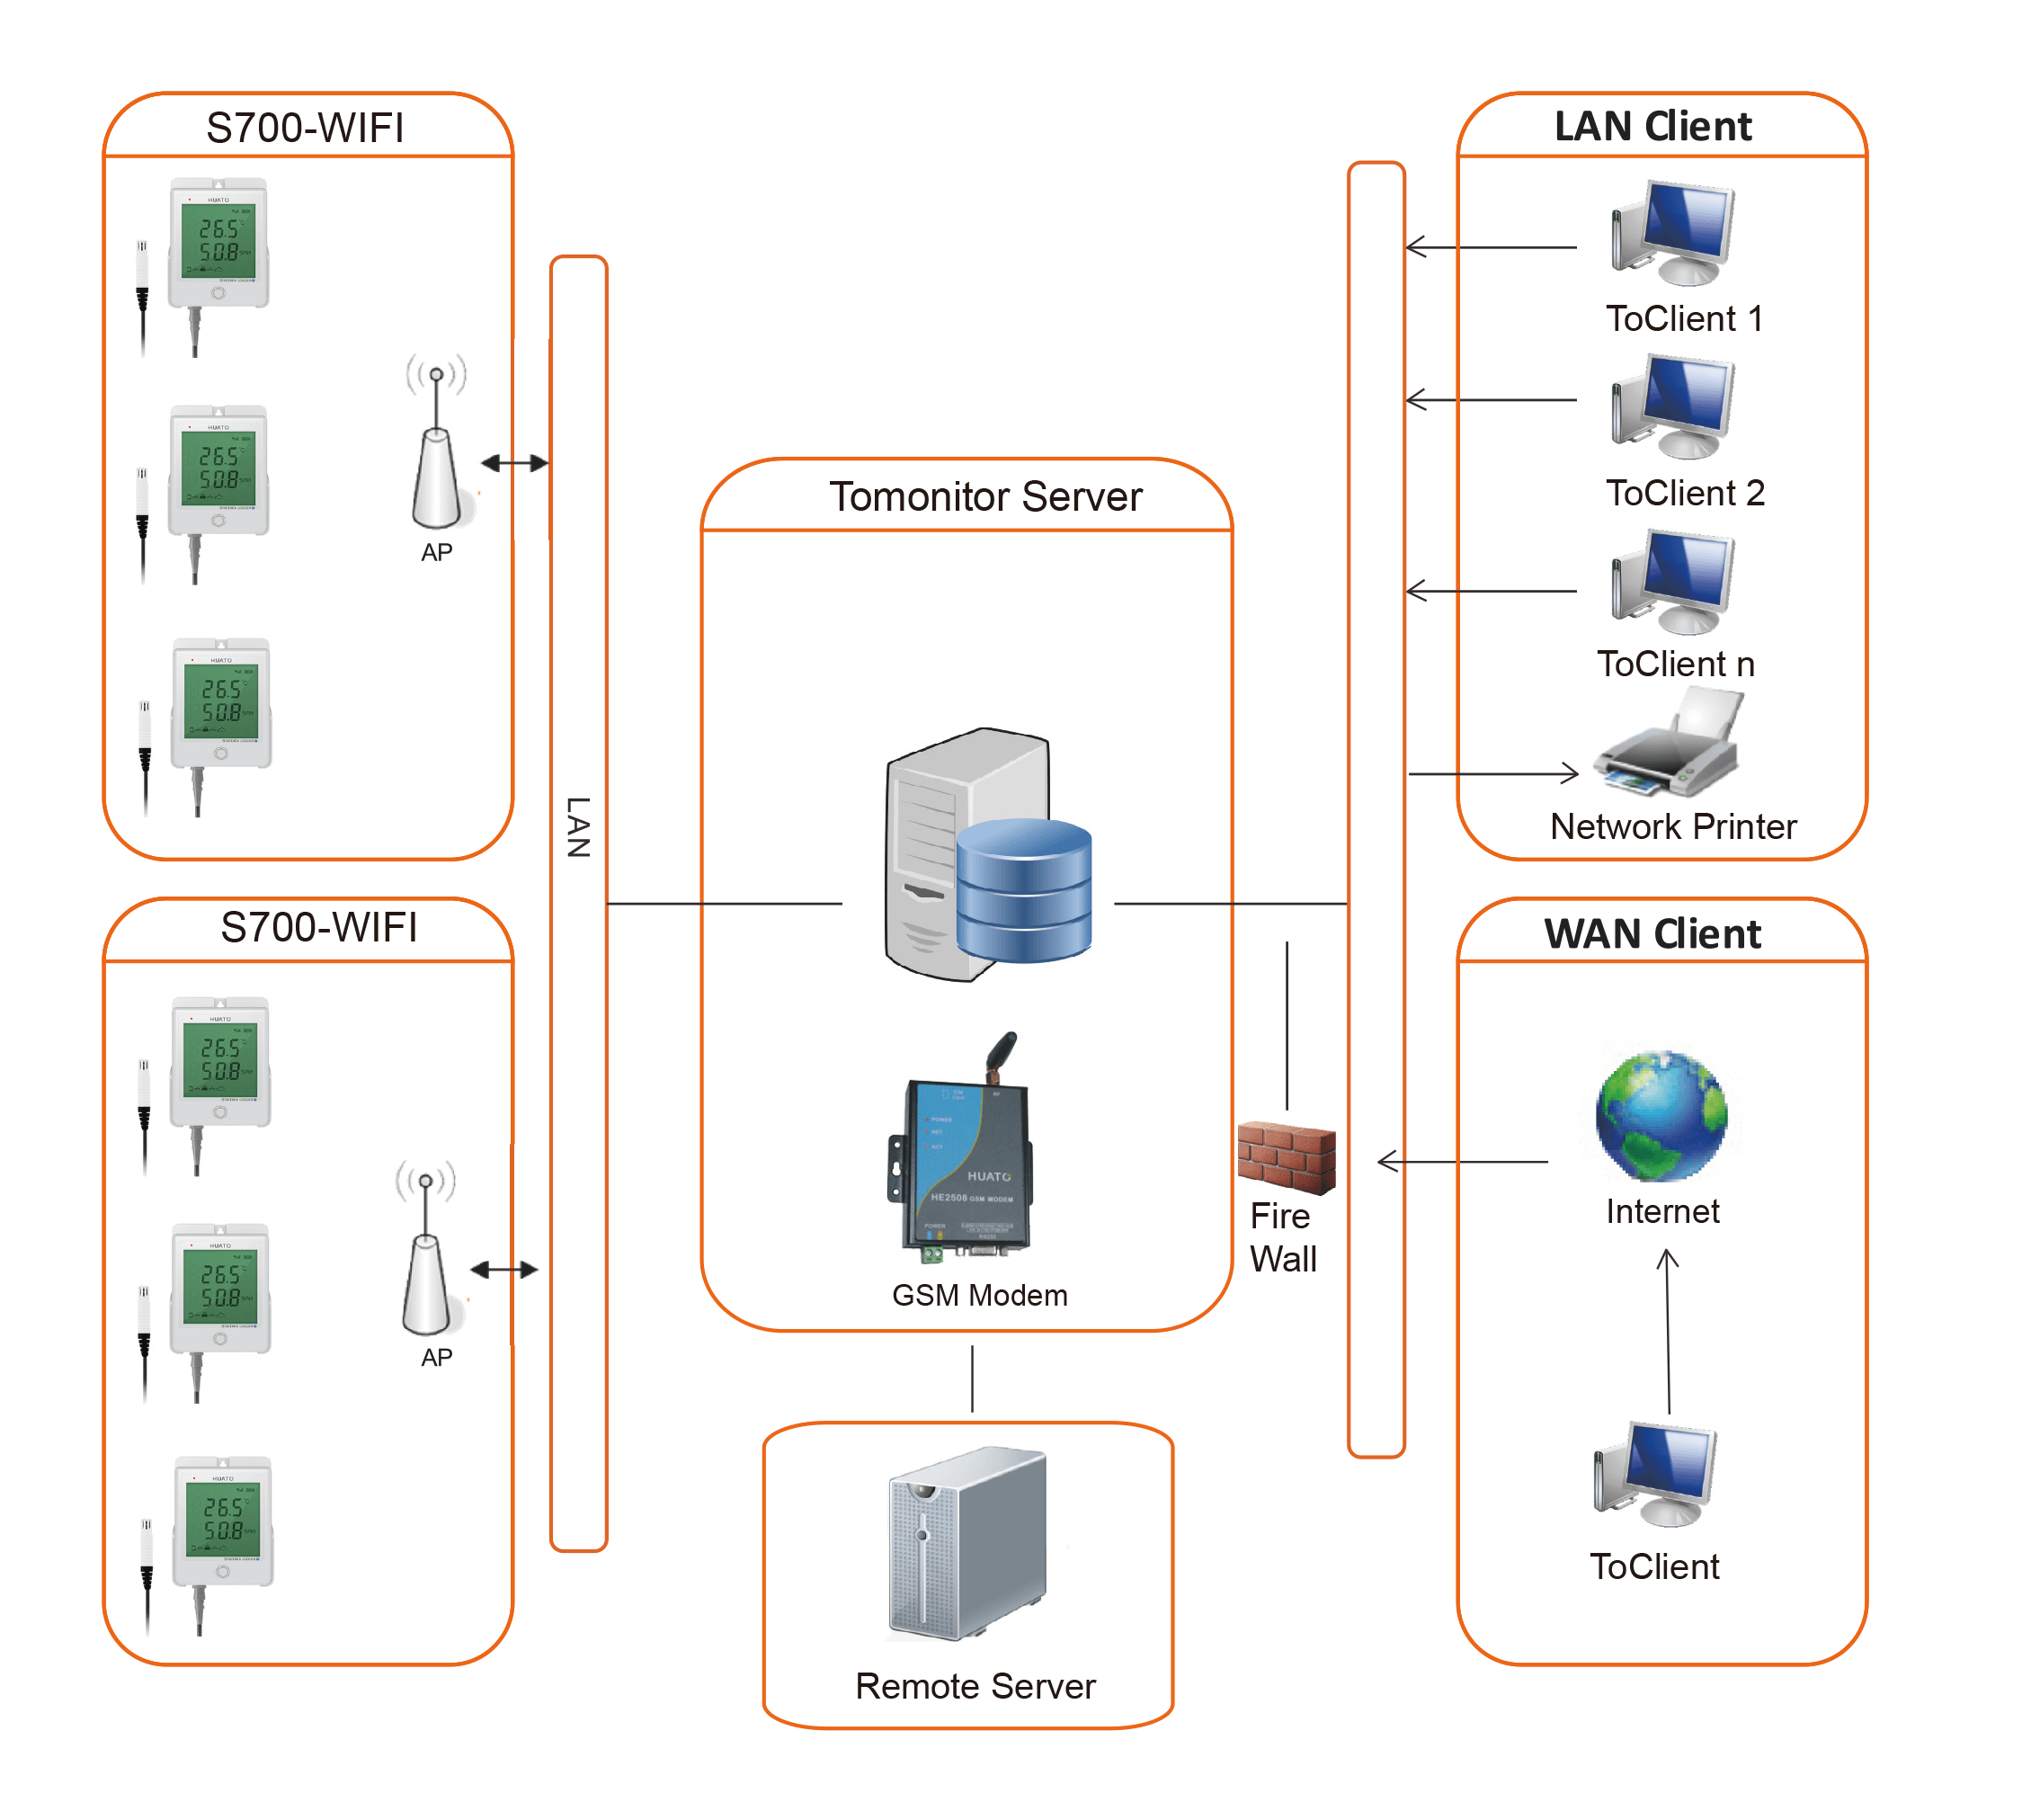 S700 WiFi Network Topology